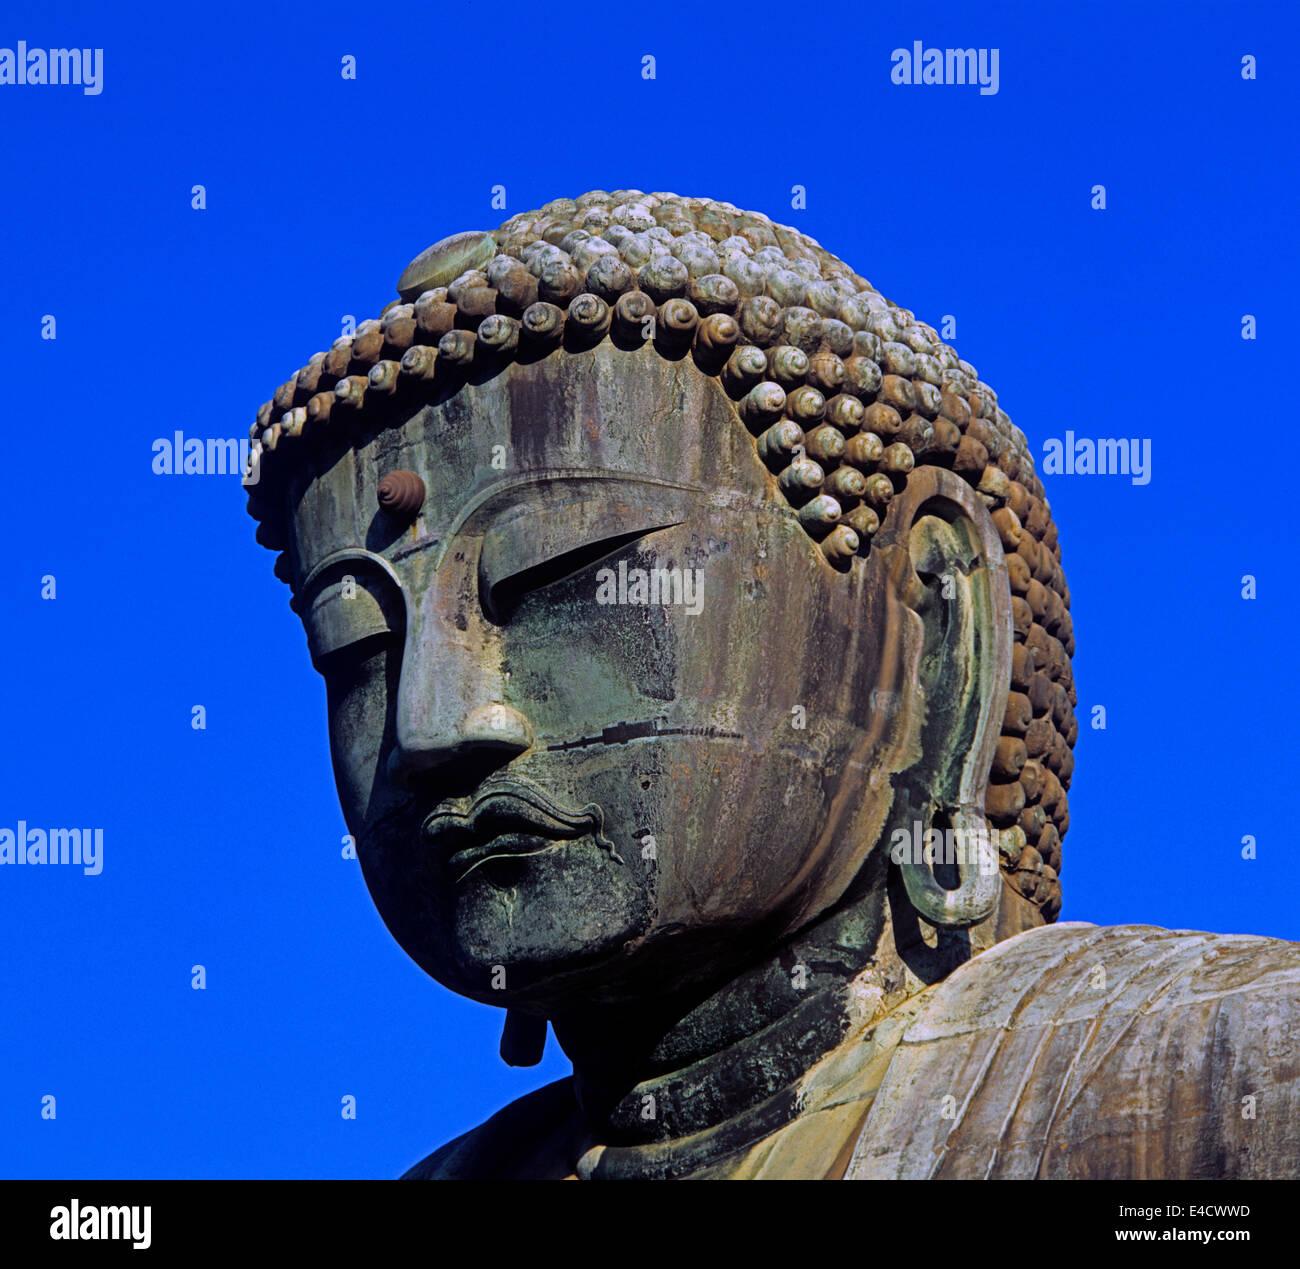 The Great Buddha in Kotoku-in temple, Kamakura, Kanagawa Prefecture, Japan - Stock Image